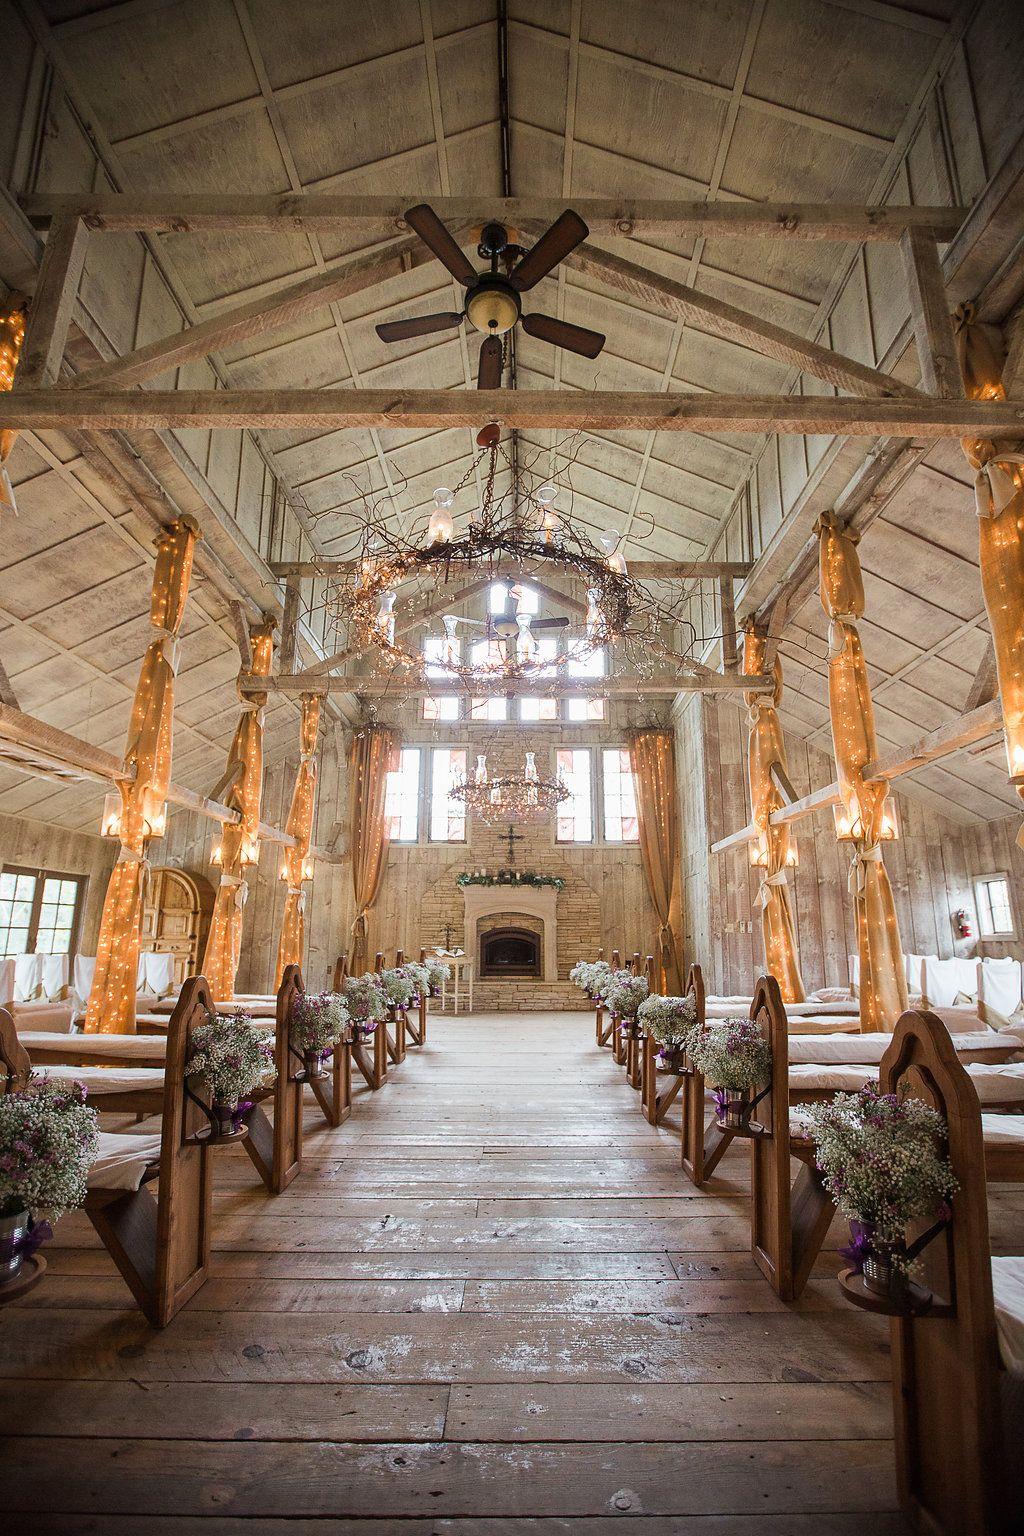 18 Stunning And Budgetfriendly Wedding Venue Ideas Weddingtopia: Cu New York Wedding Venue At Reisefeber.org